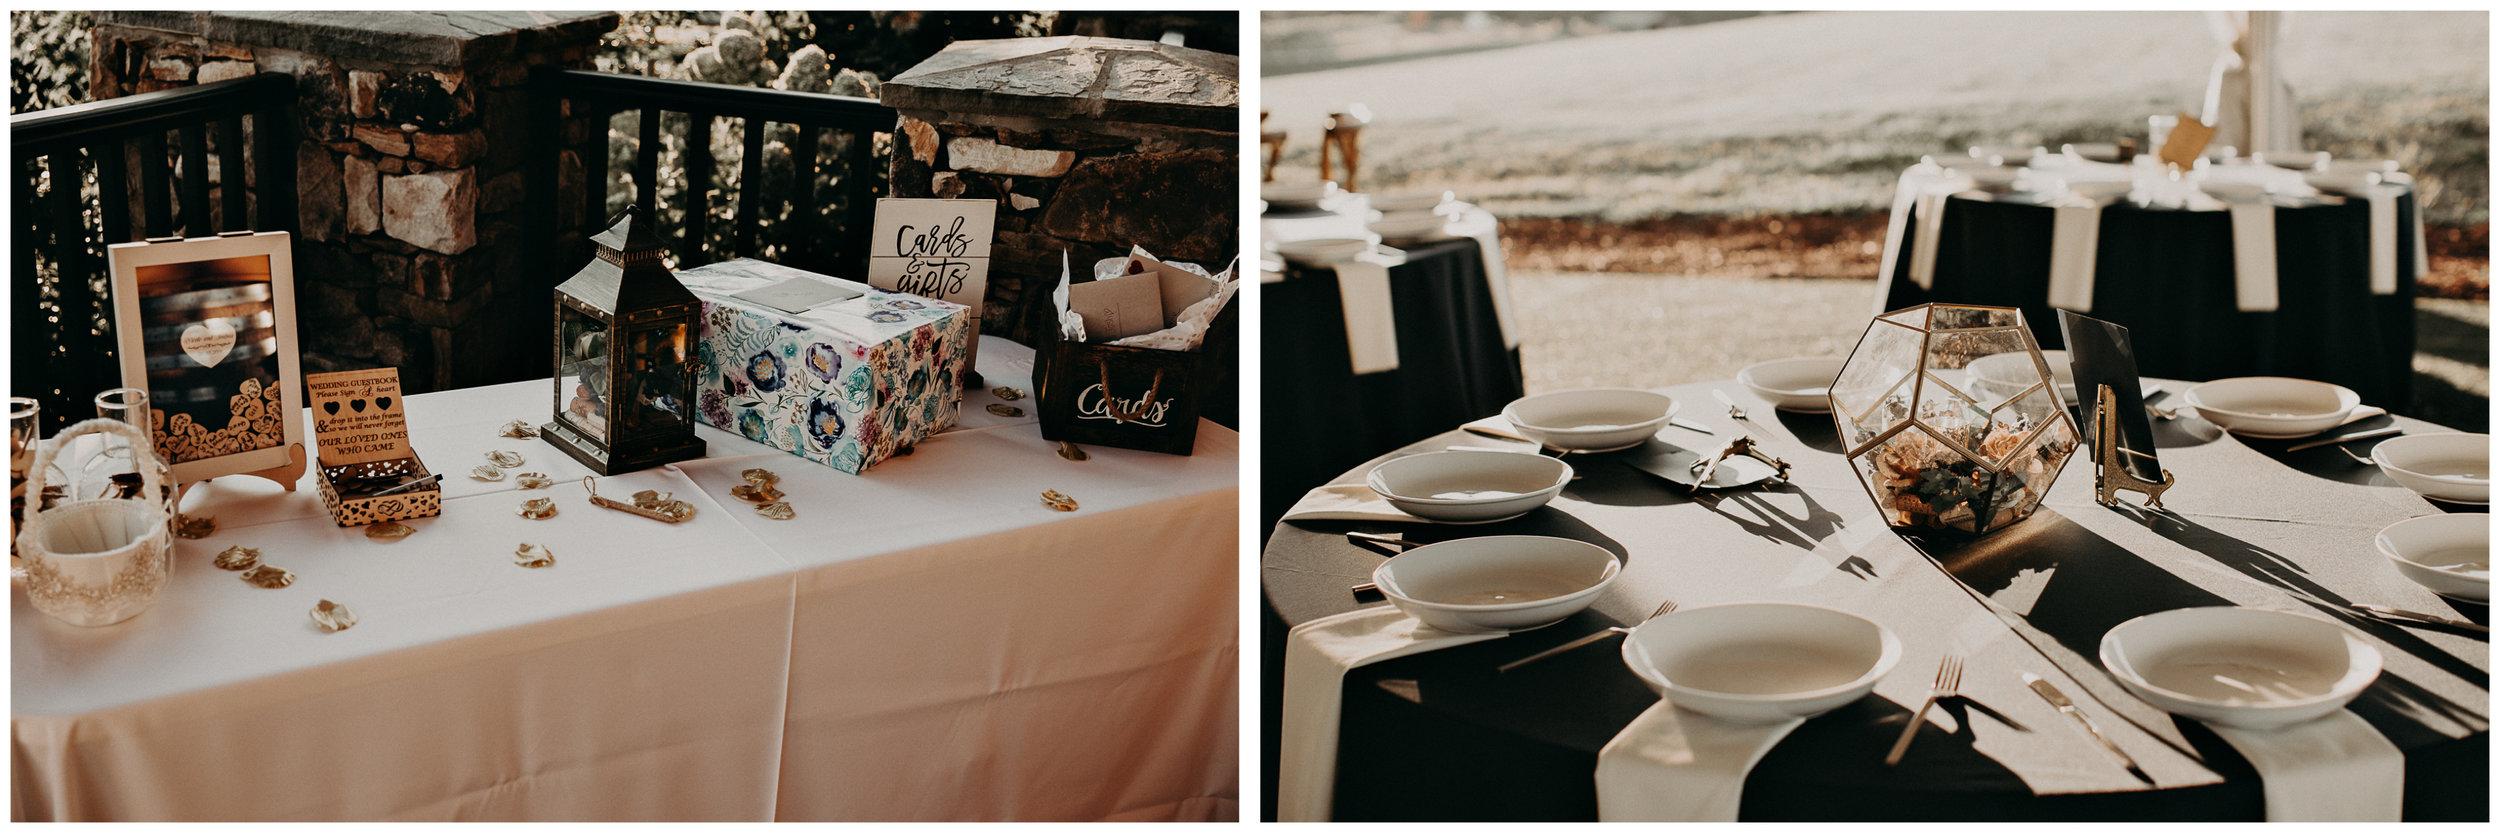 62- Kaya_vineyard_dahlonega_wedding_venue_details_decor_aline_marin_photography.jpg